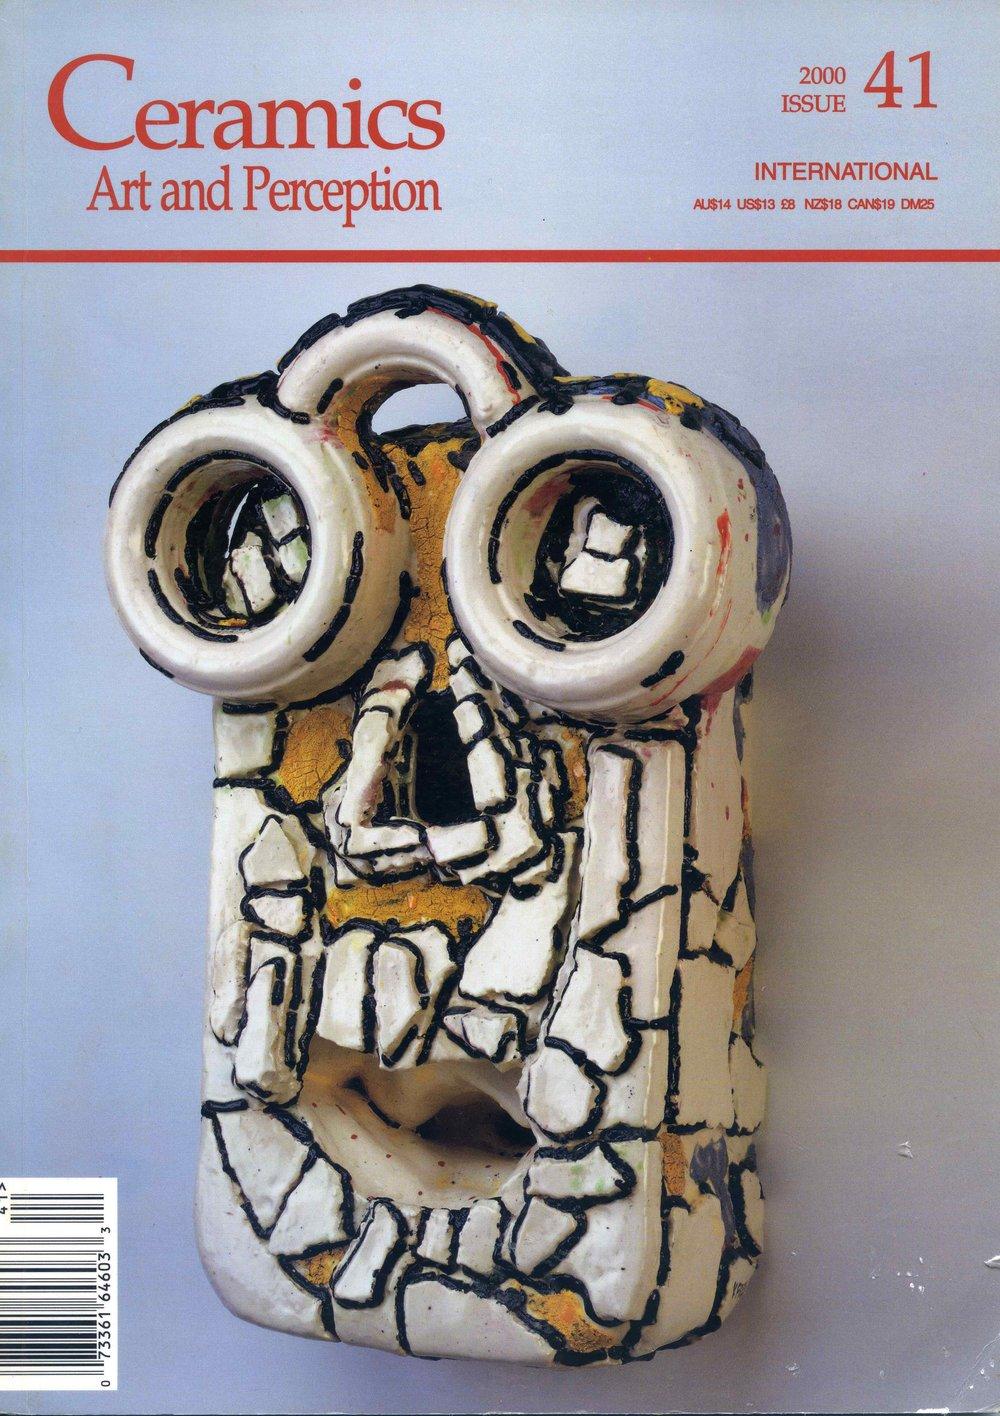 Ceramic Art and Perception, 2000